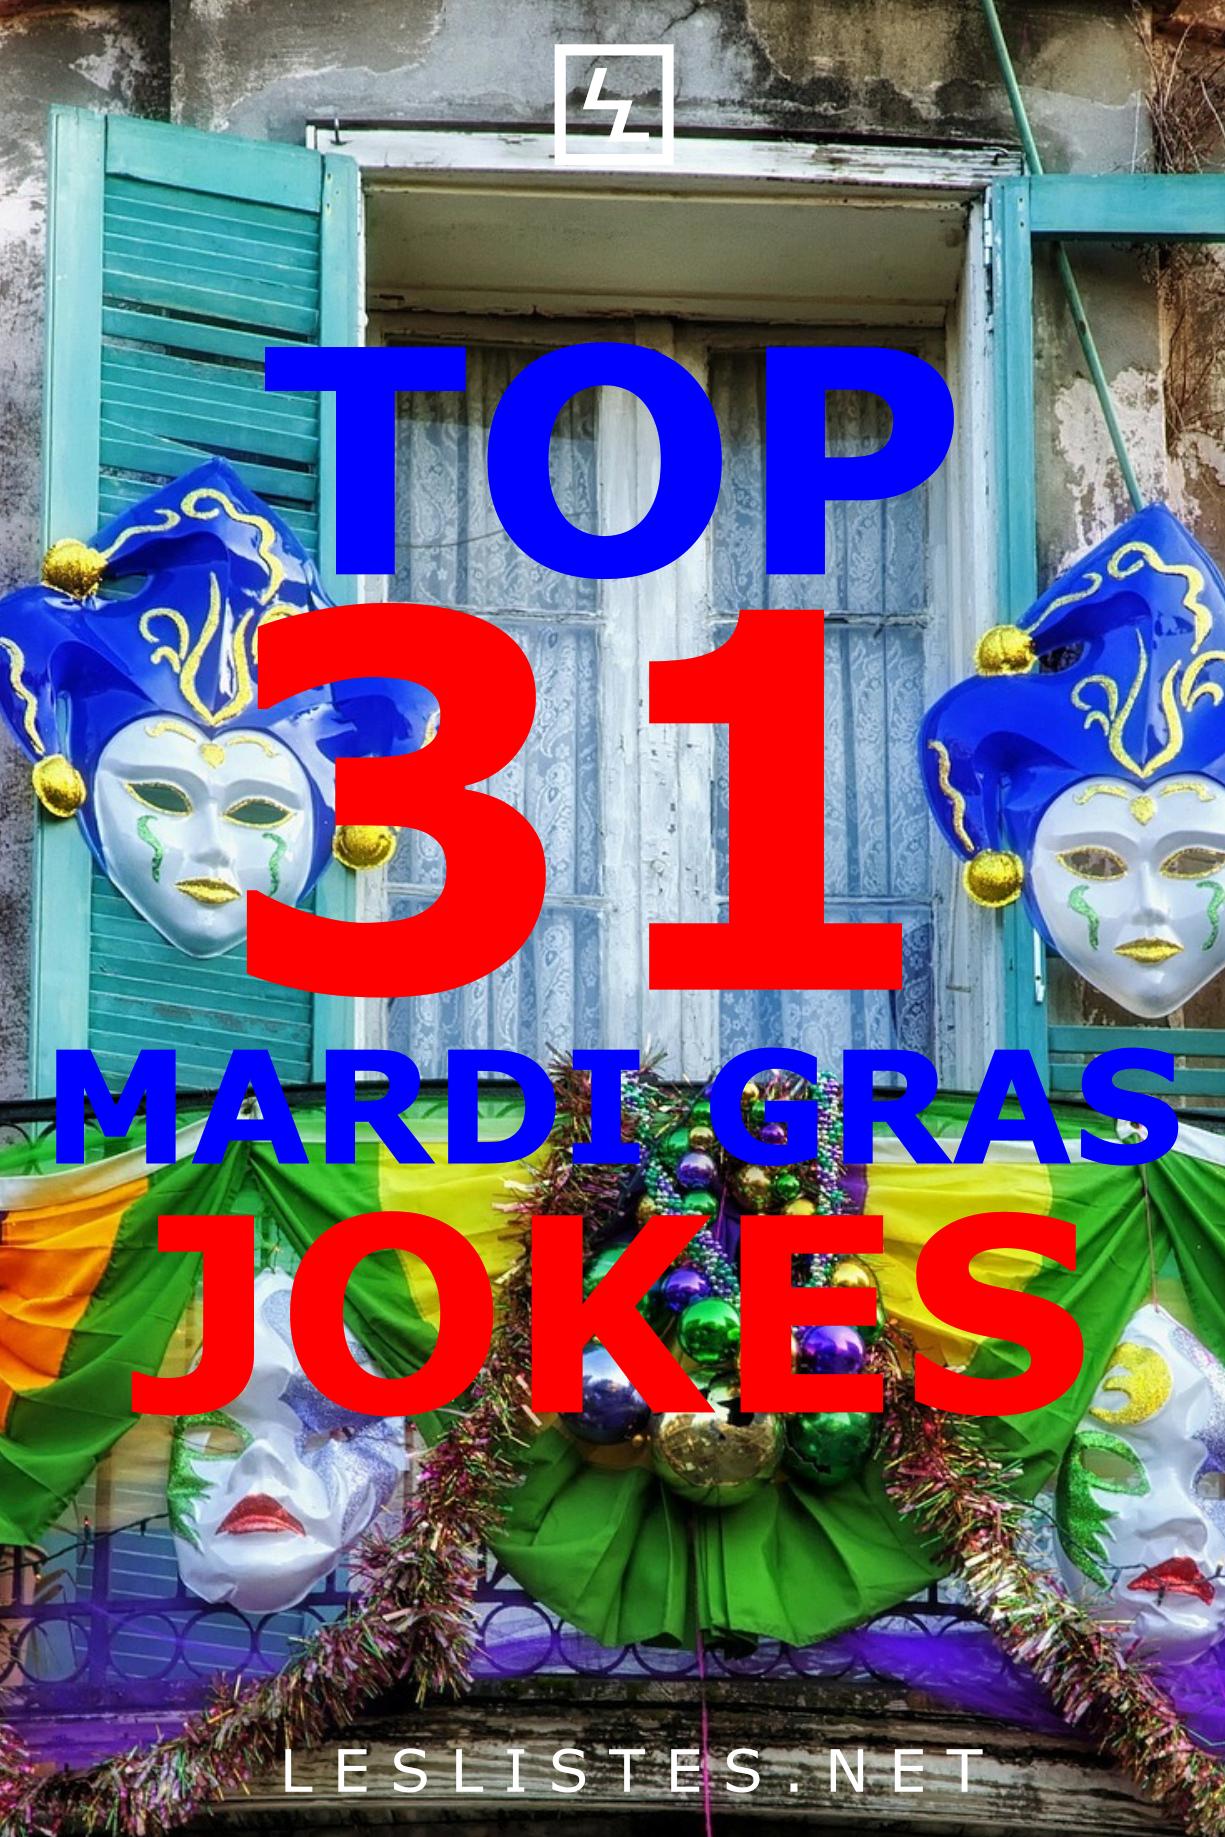 Top 31 Mardi Gras Jokes That Will Make You LOL